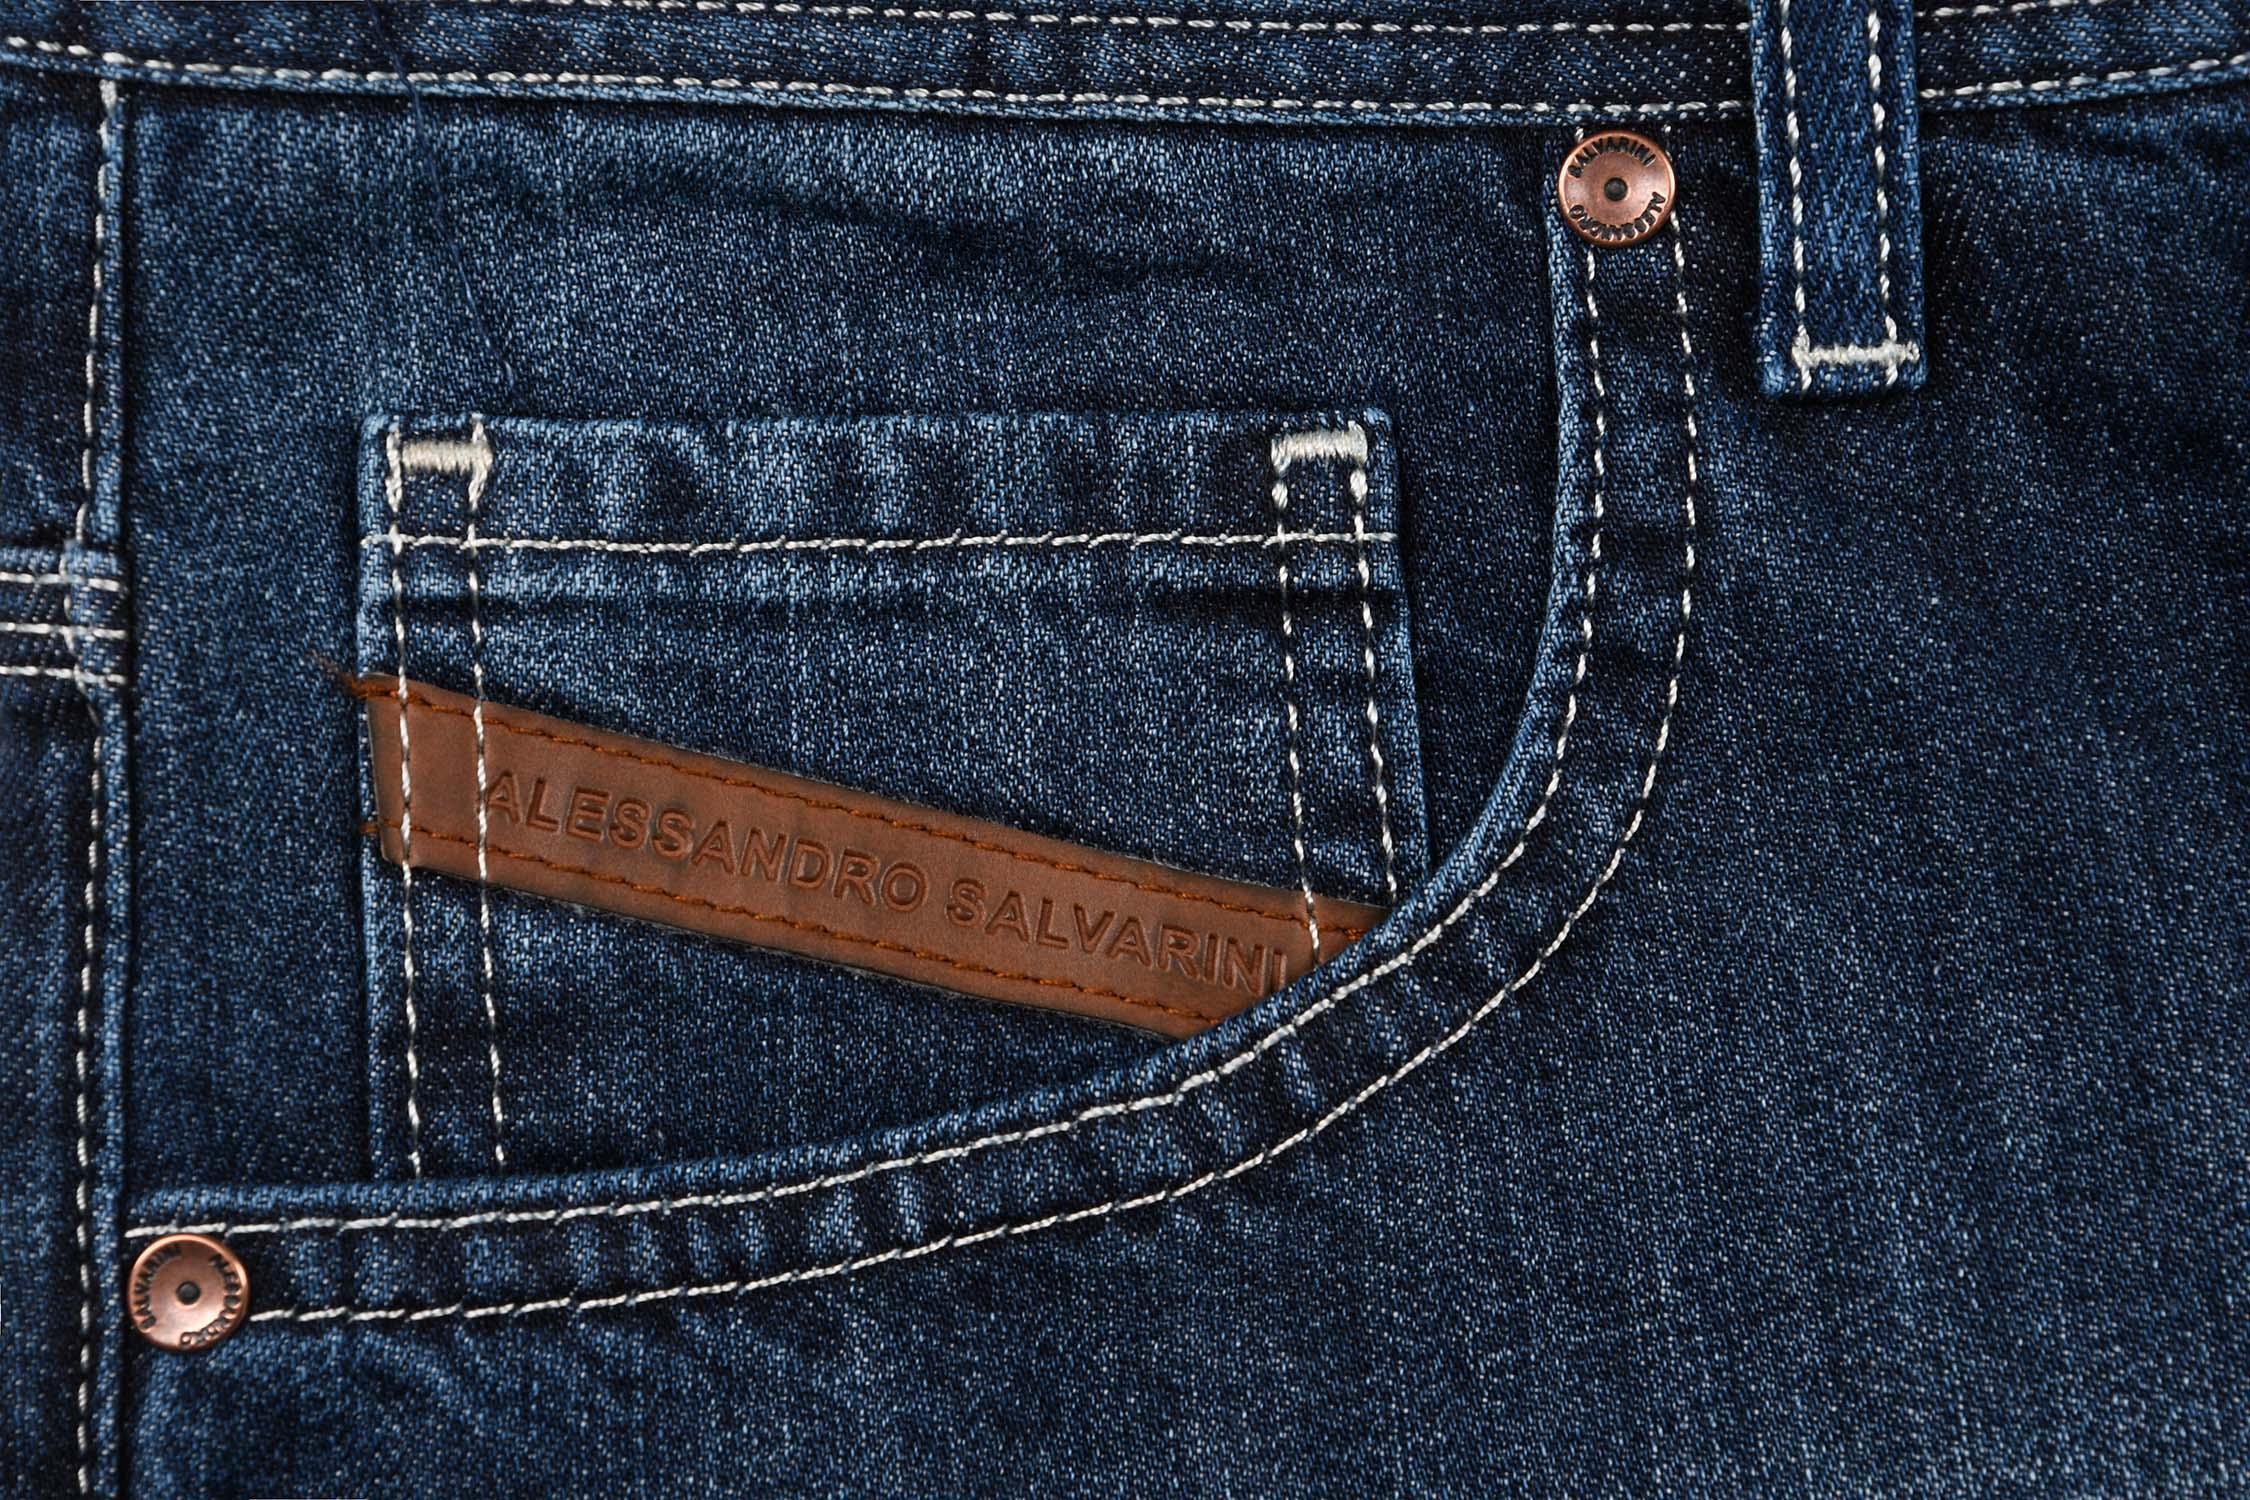 A-Salvarini-Designer-Herren-Jeans-Short-kurze-Sommer-Hose-Jeansshorts-Bermuda Indexbild 22